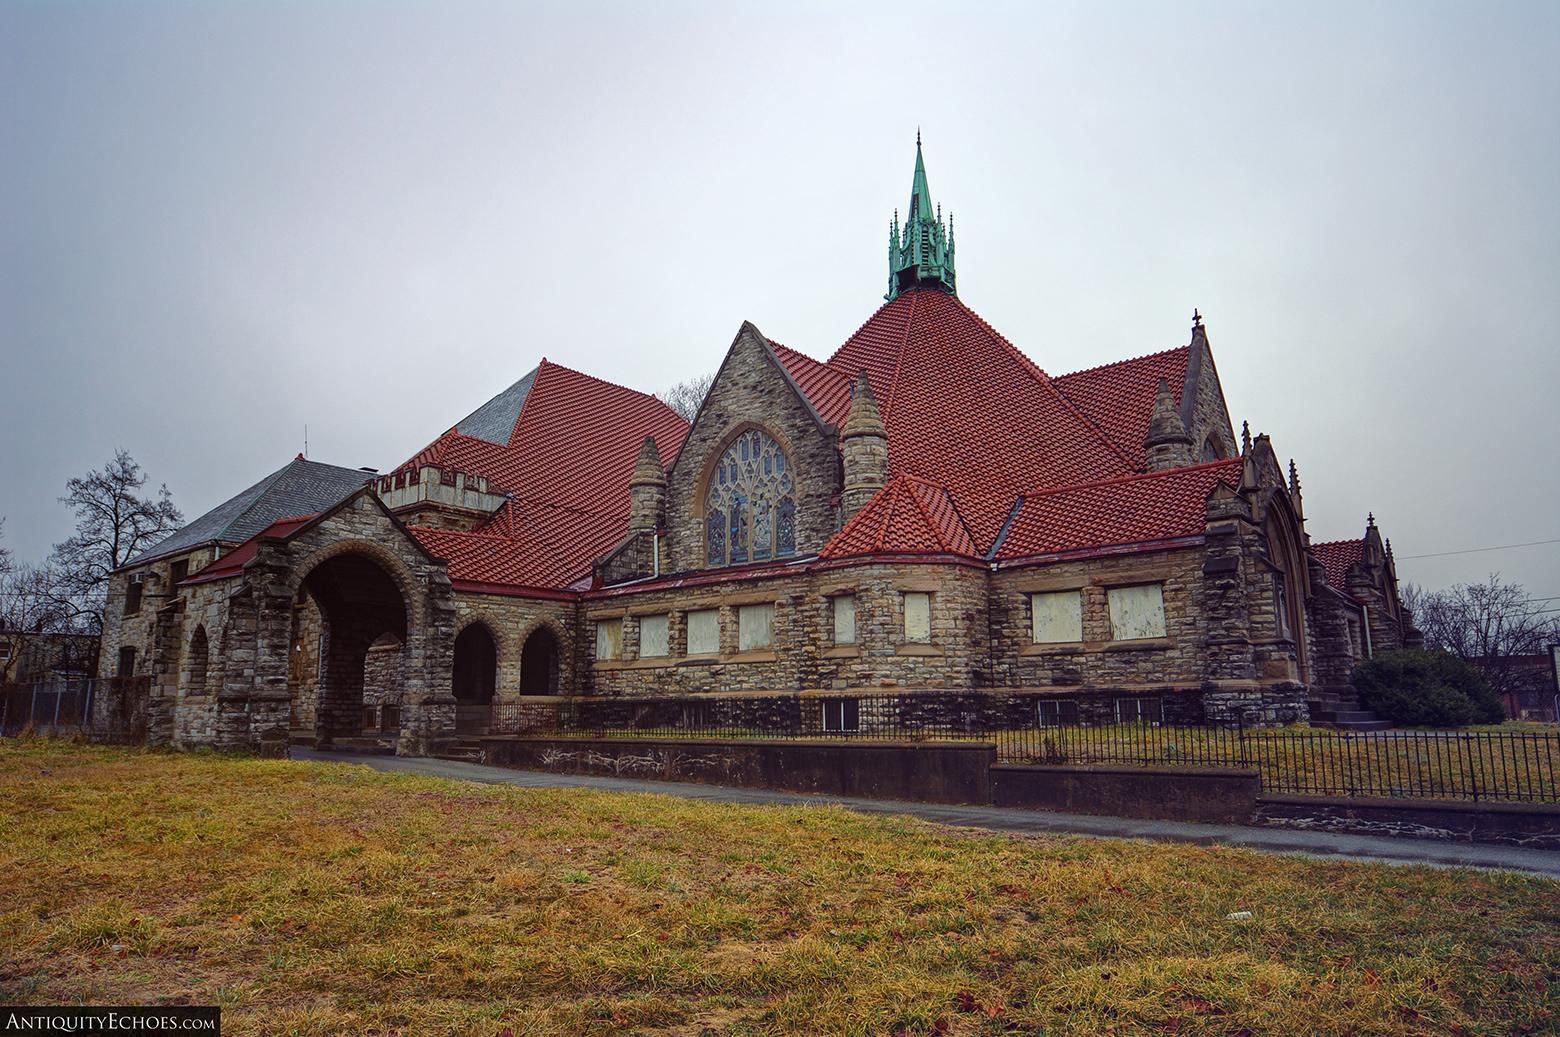 Third Presbyterian - Under Overcast Skies